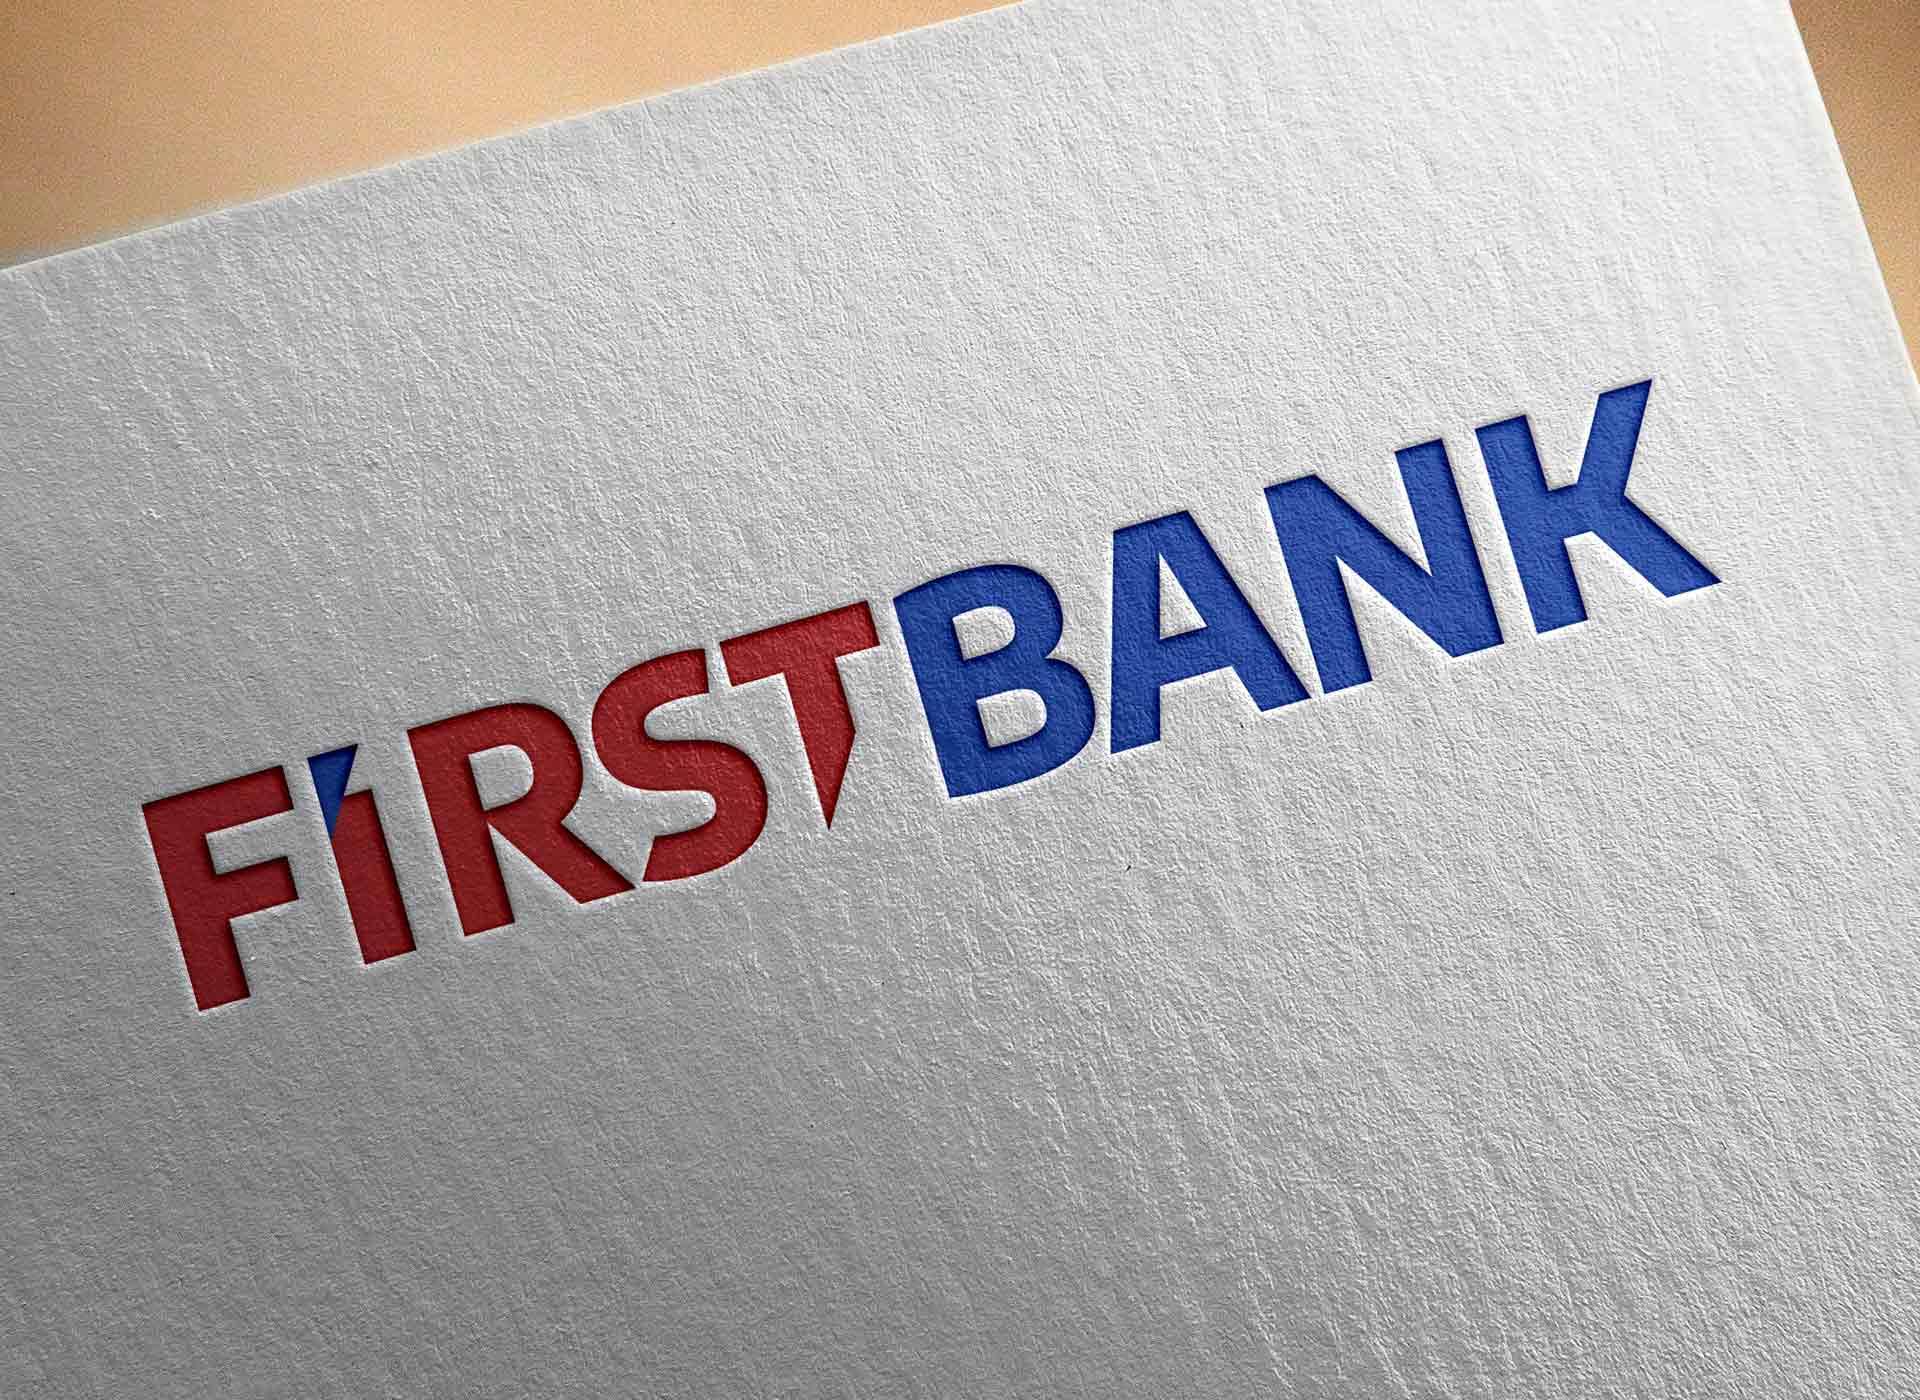 first bank portofoliu inoveo logo deboss